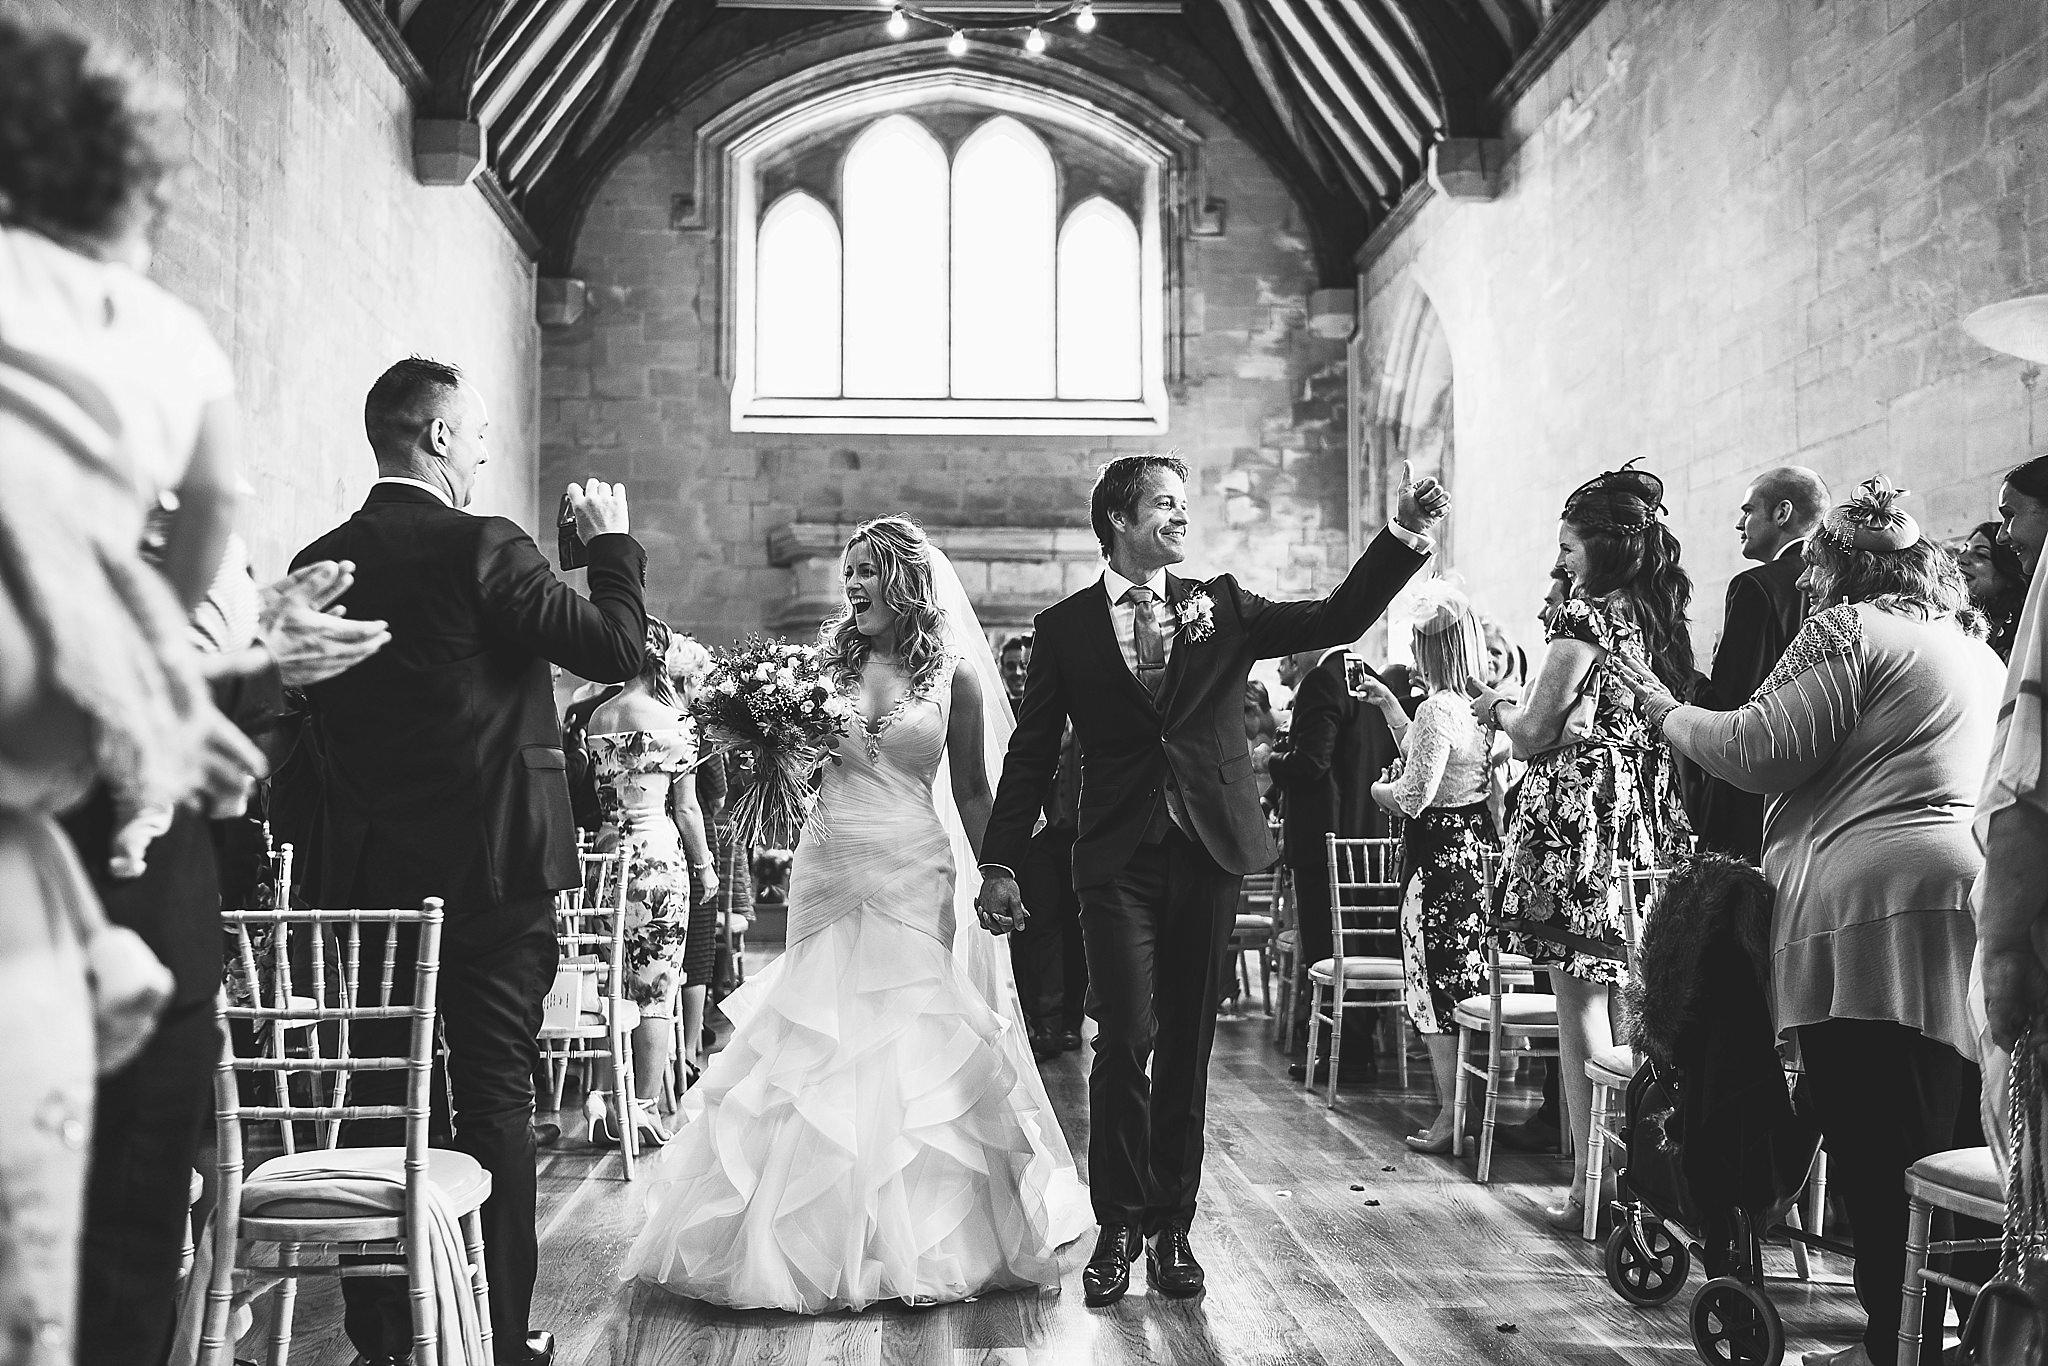 aga-tomaszek-wedding-photographer-cardiff-2016_1045